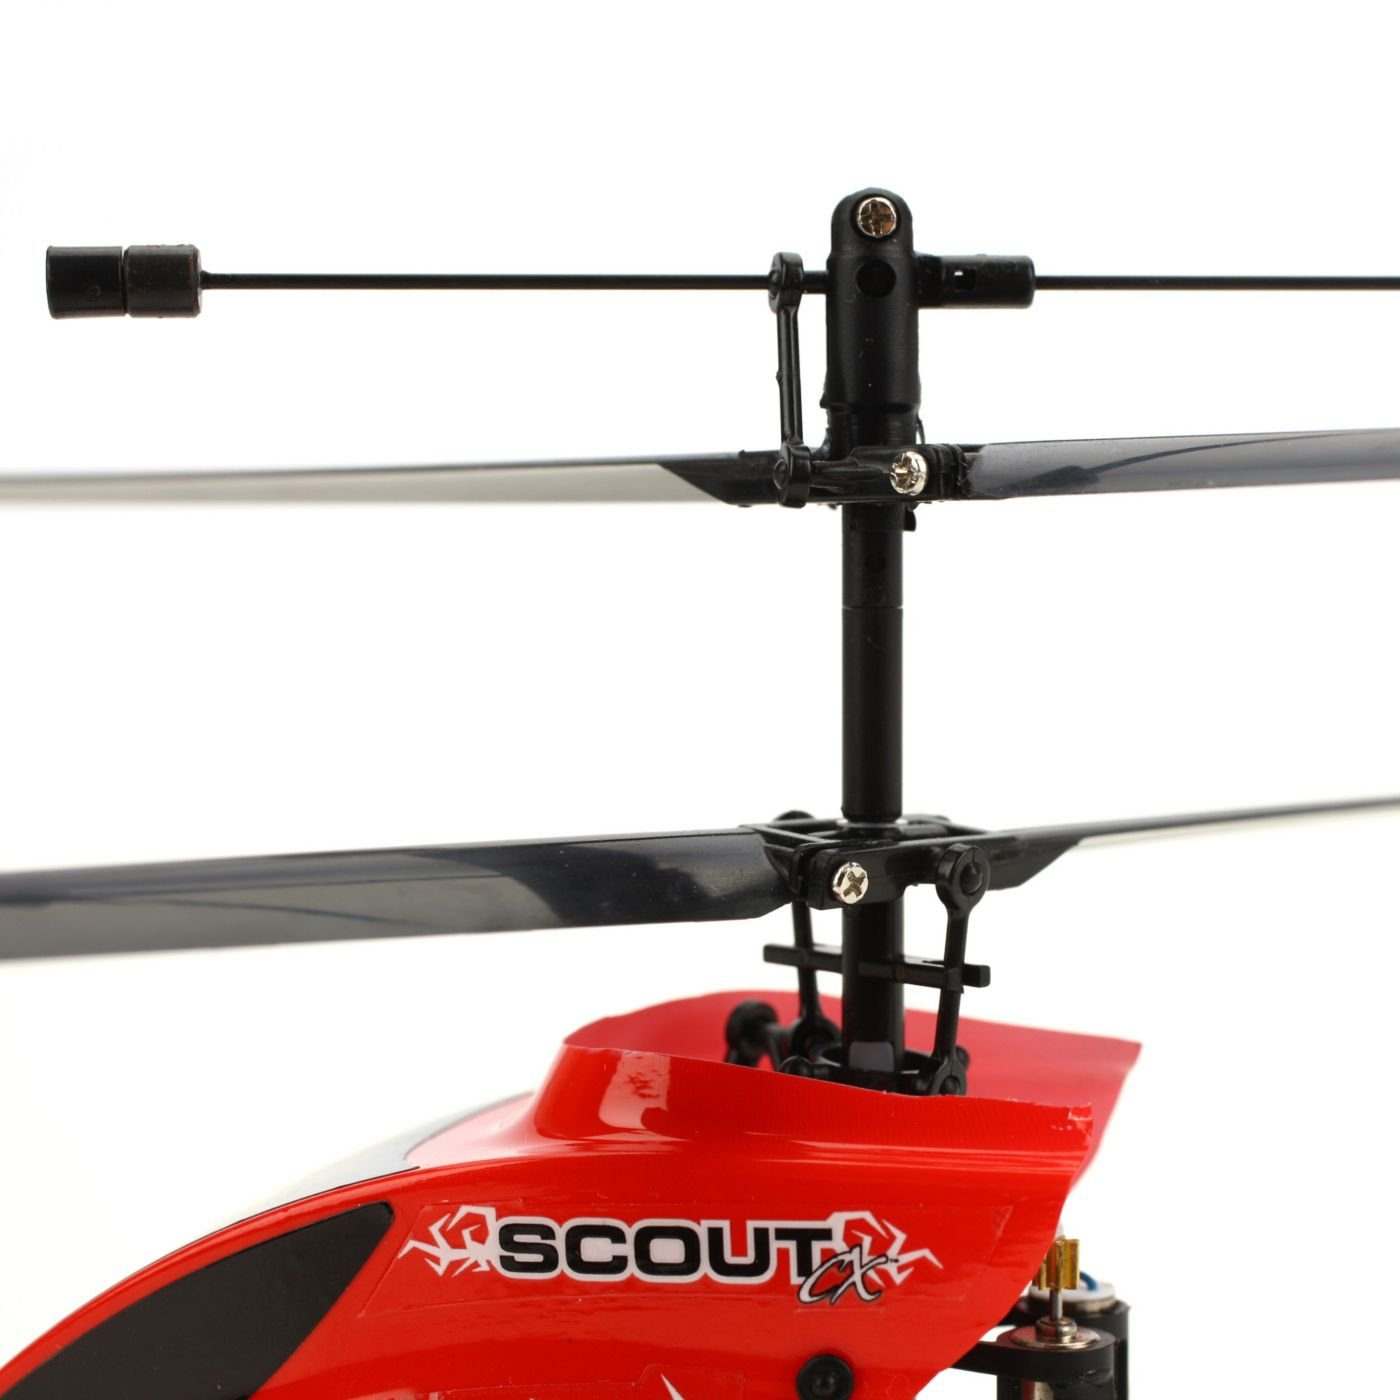 Blade Scout CX RTF 3-Ch Heli Vehicle